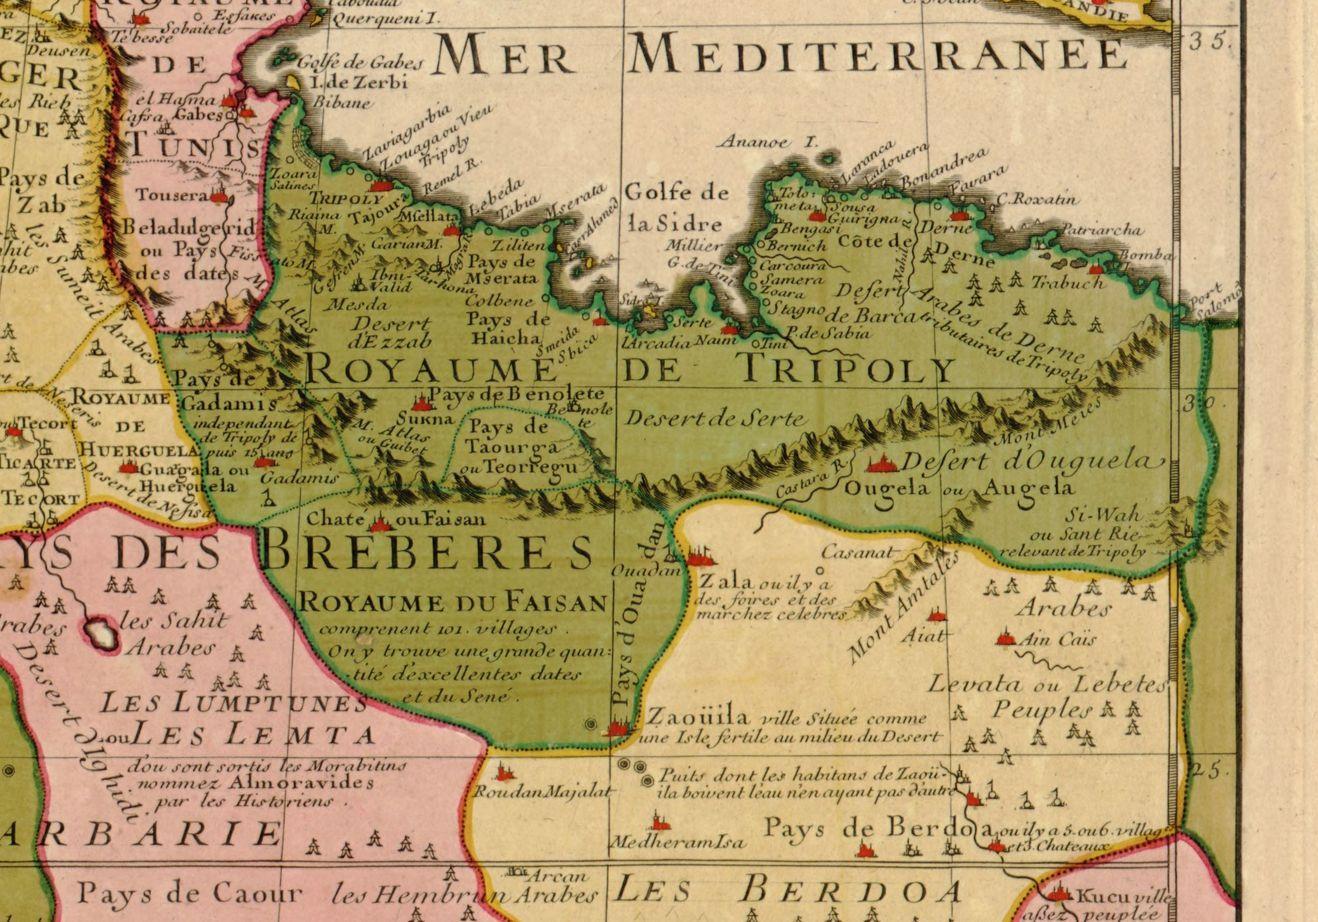 FileRoyaume de Tripoli 1707jpg Wikimedia Commons